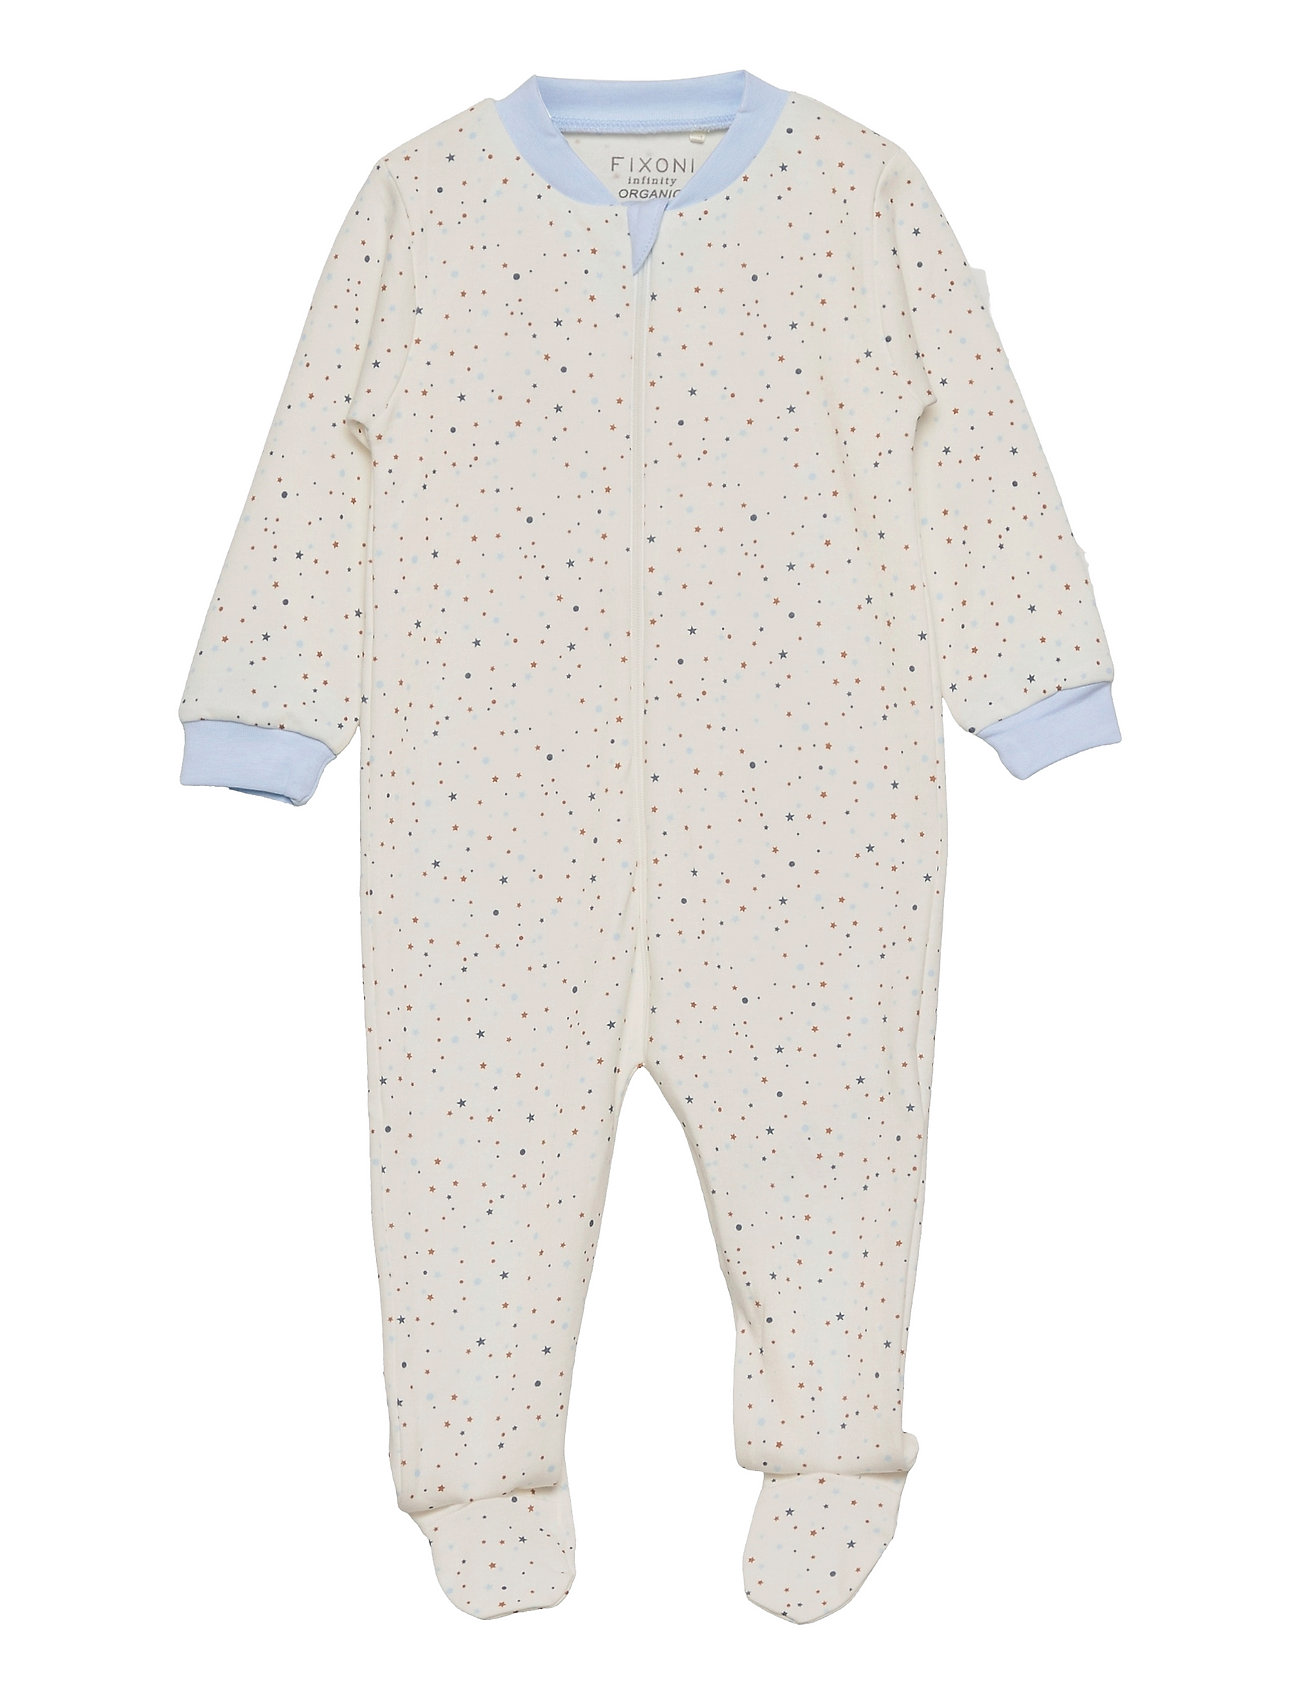 Nightsuit W.Zipper & Foot Pyjamas Sie Jumpsuit Hvid Fixoni